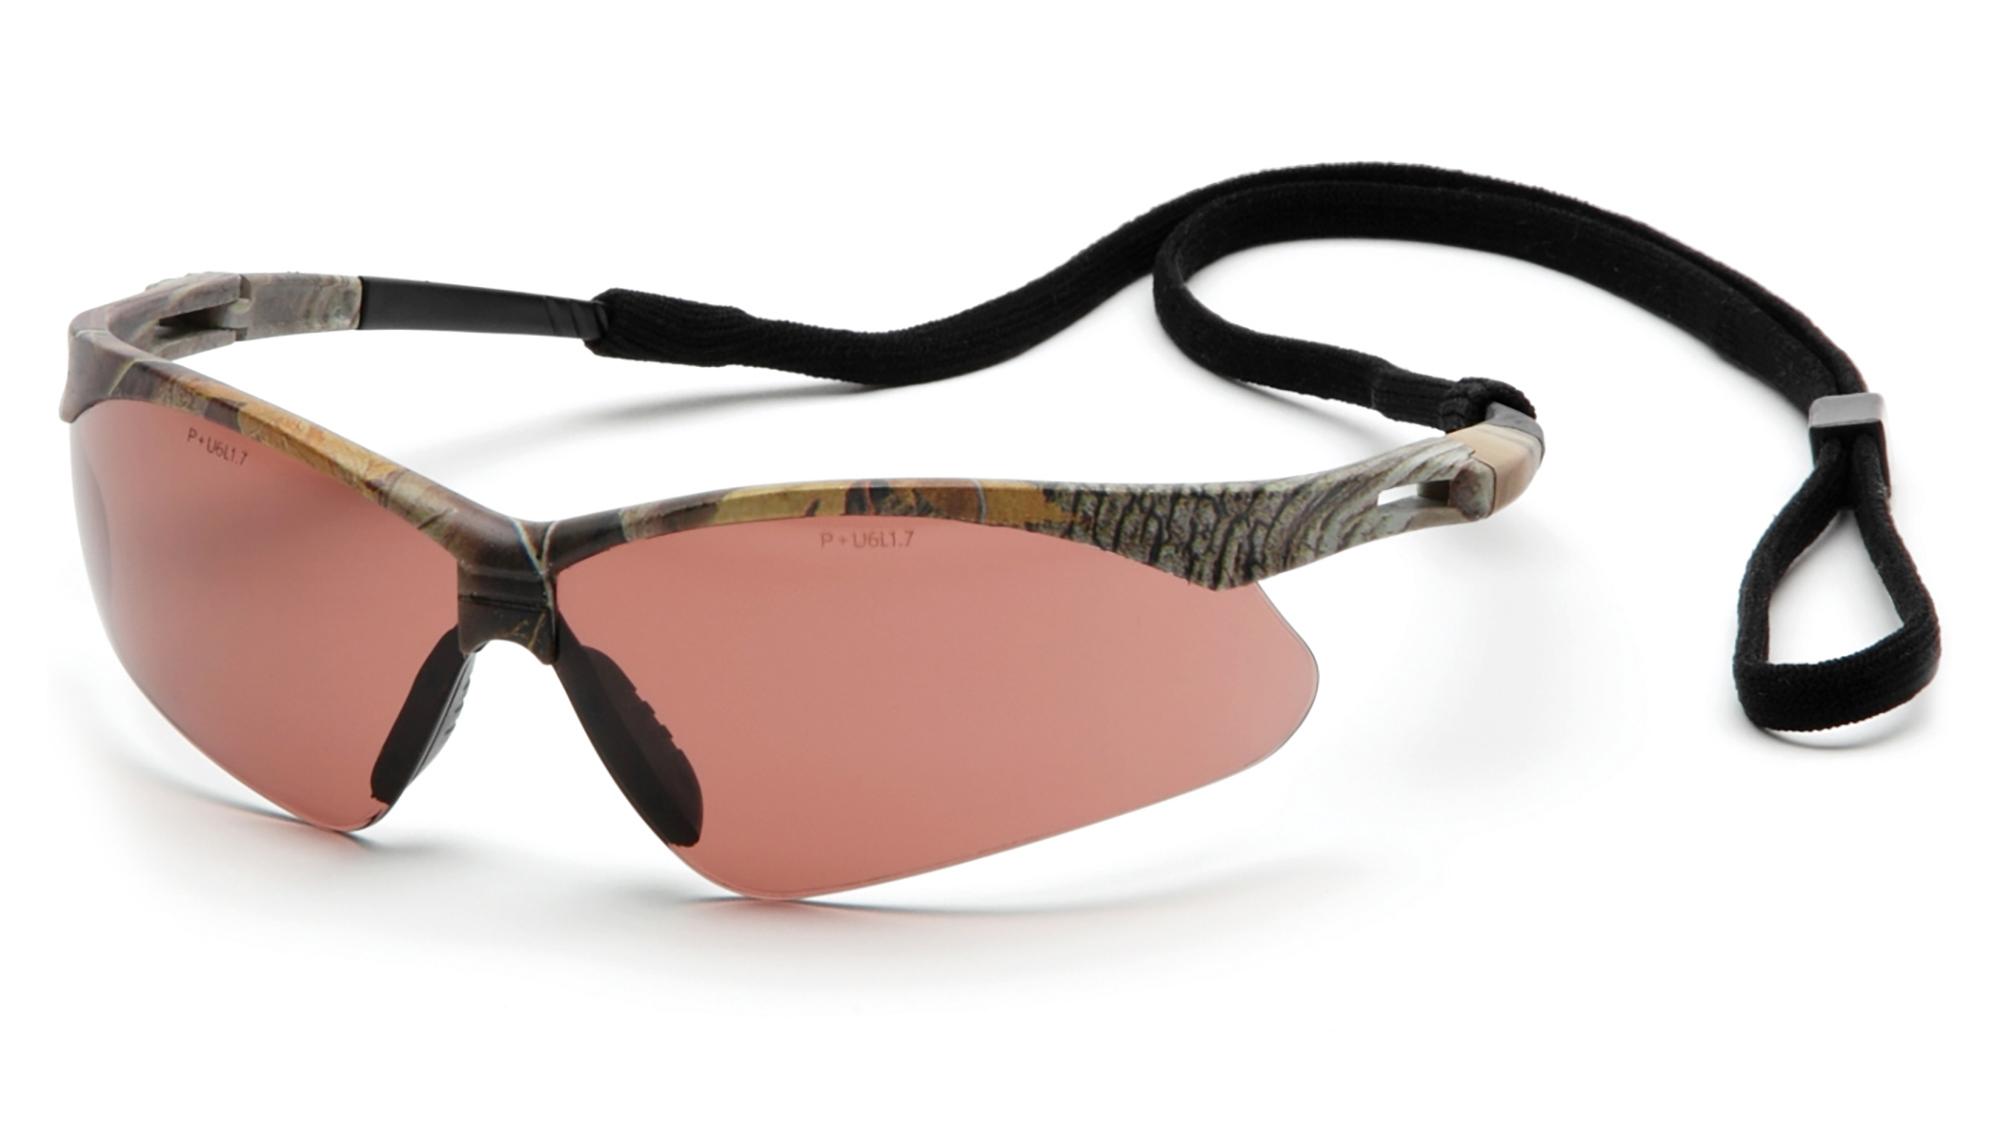 PMXTREME Safety Glasses - Black Frames Clear Lens